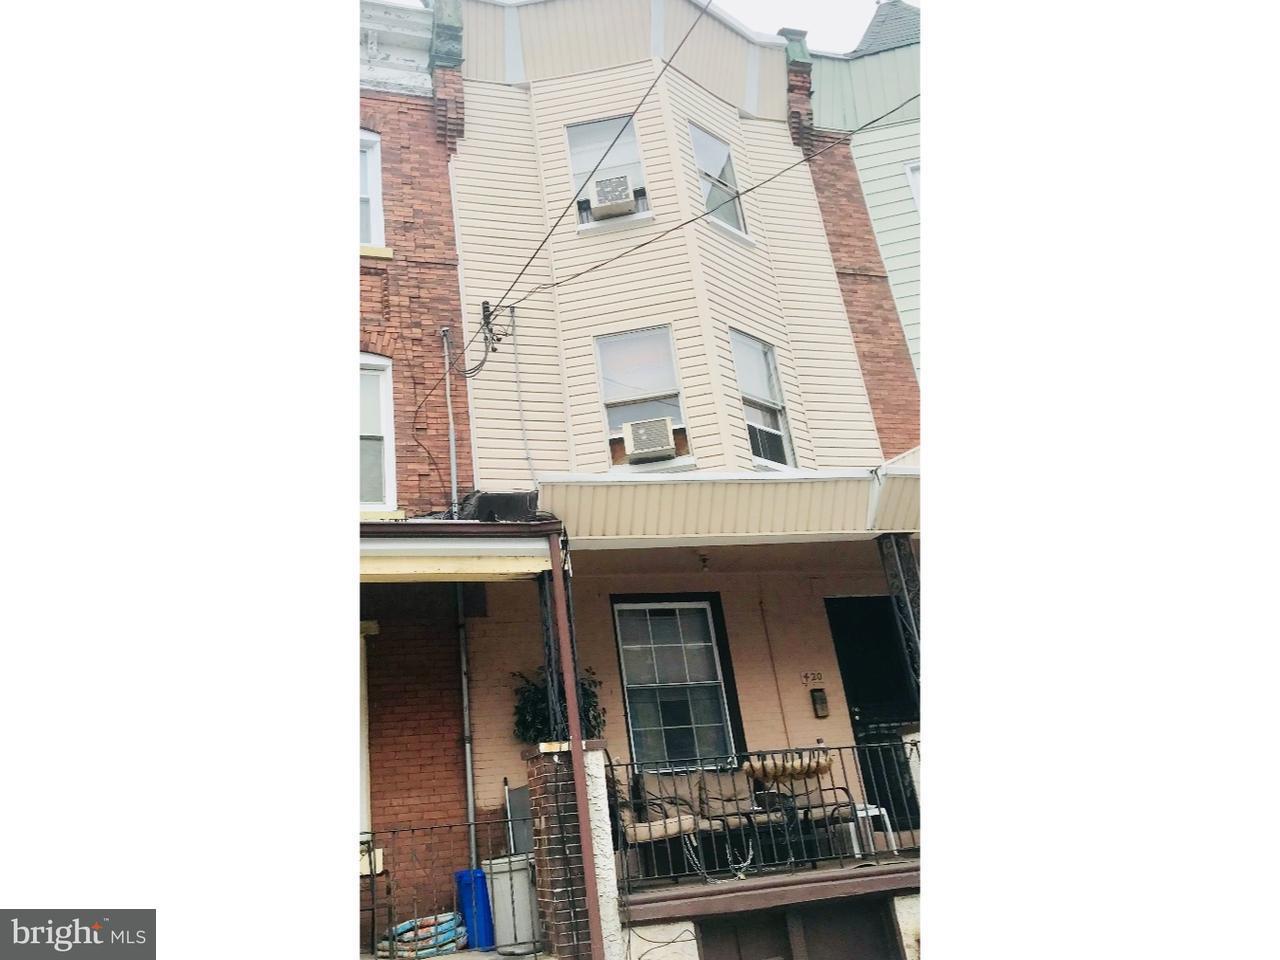 420 N 62ND Philadelphia, PA 19151